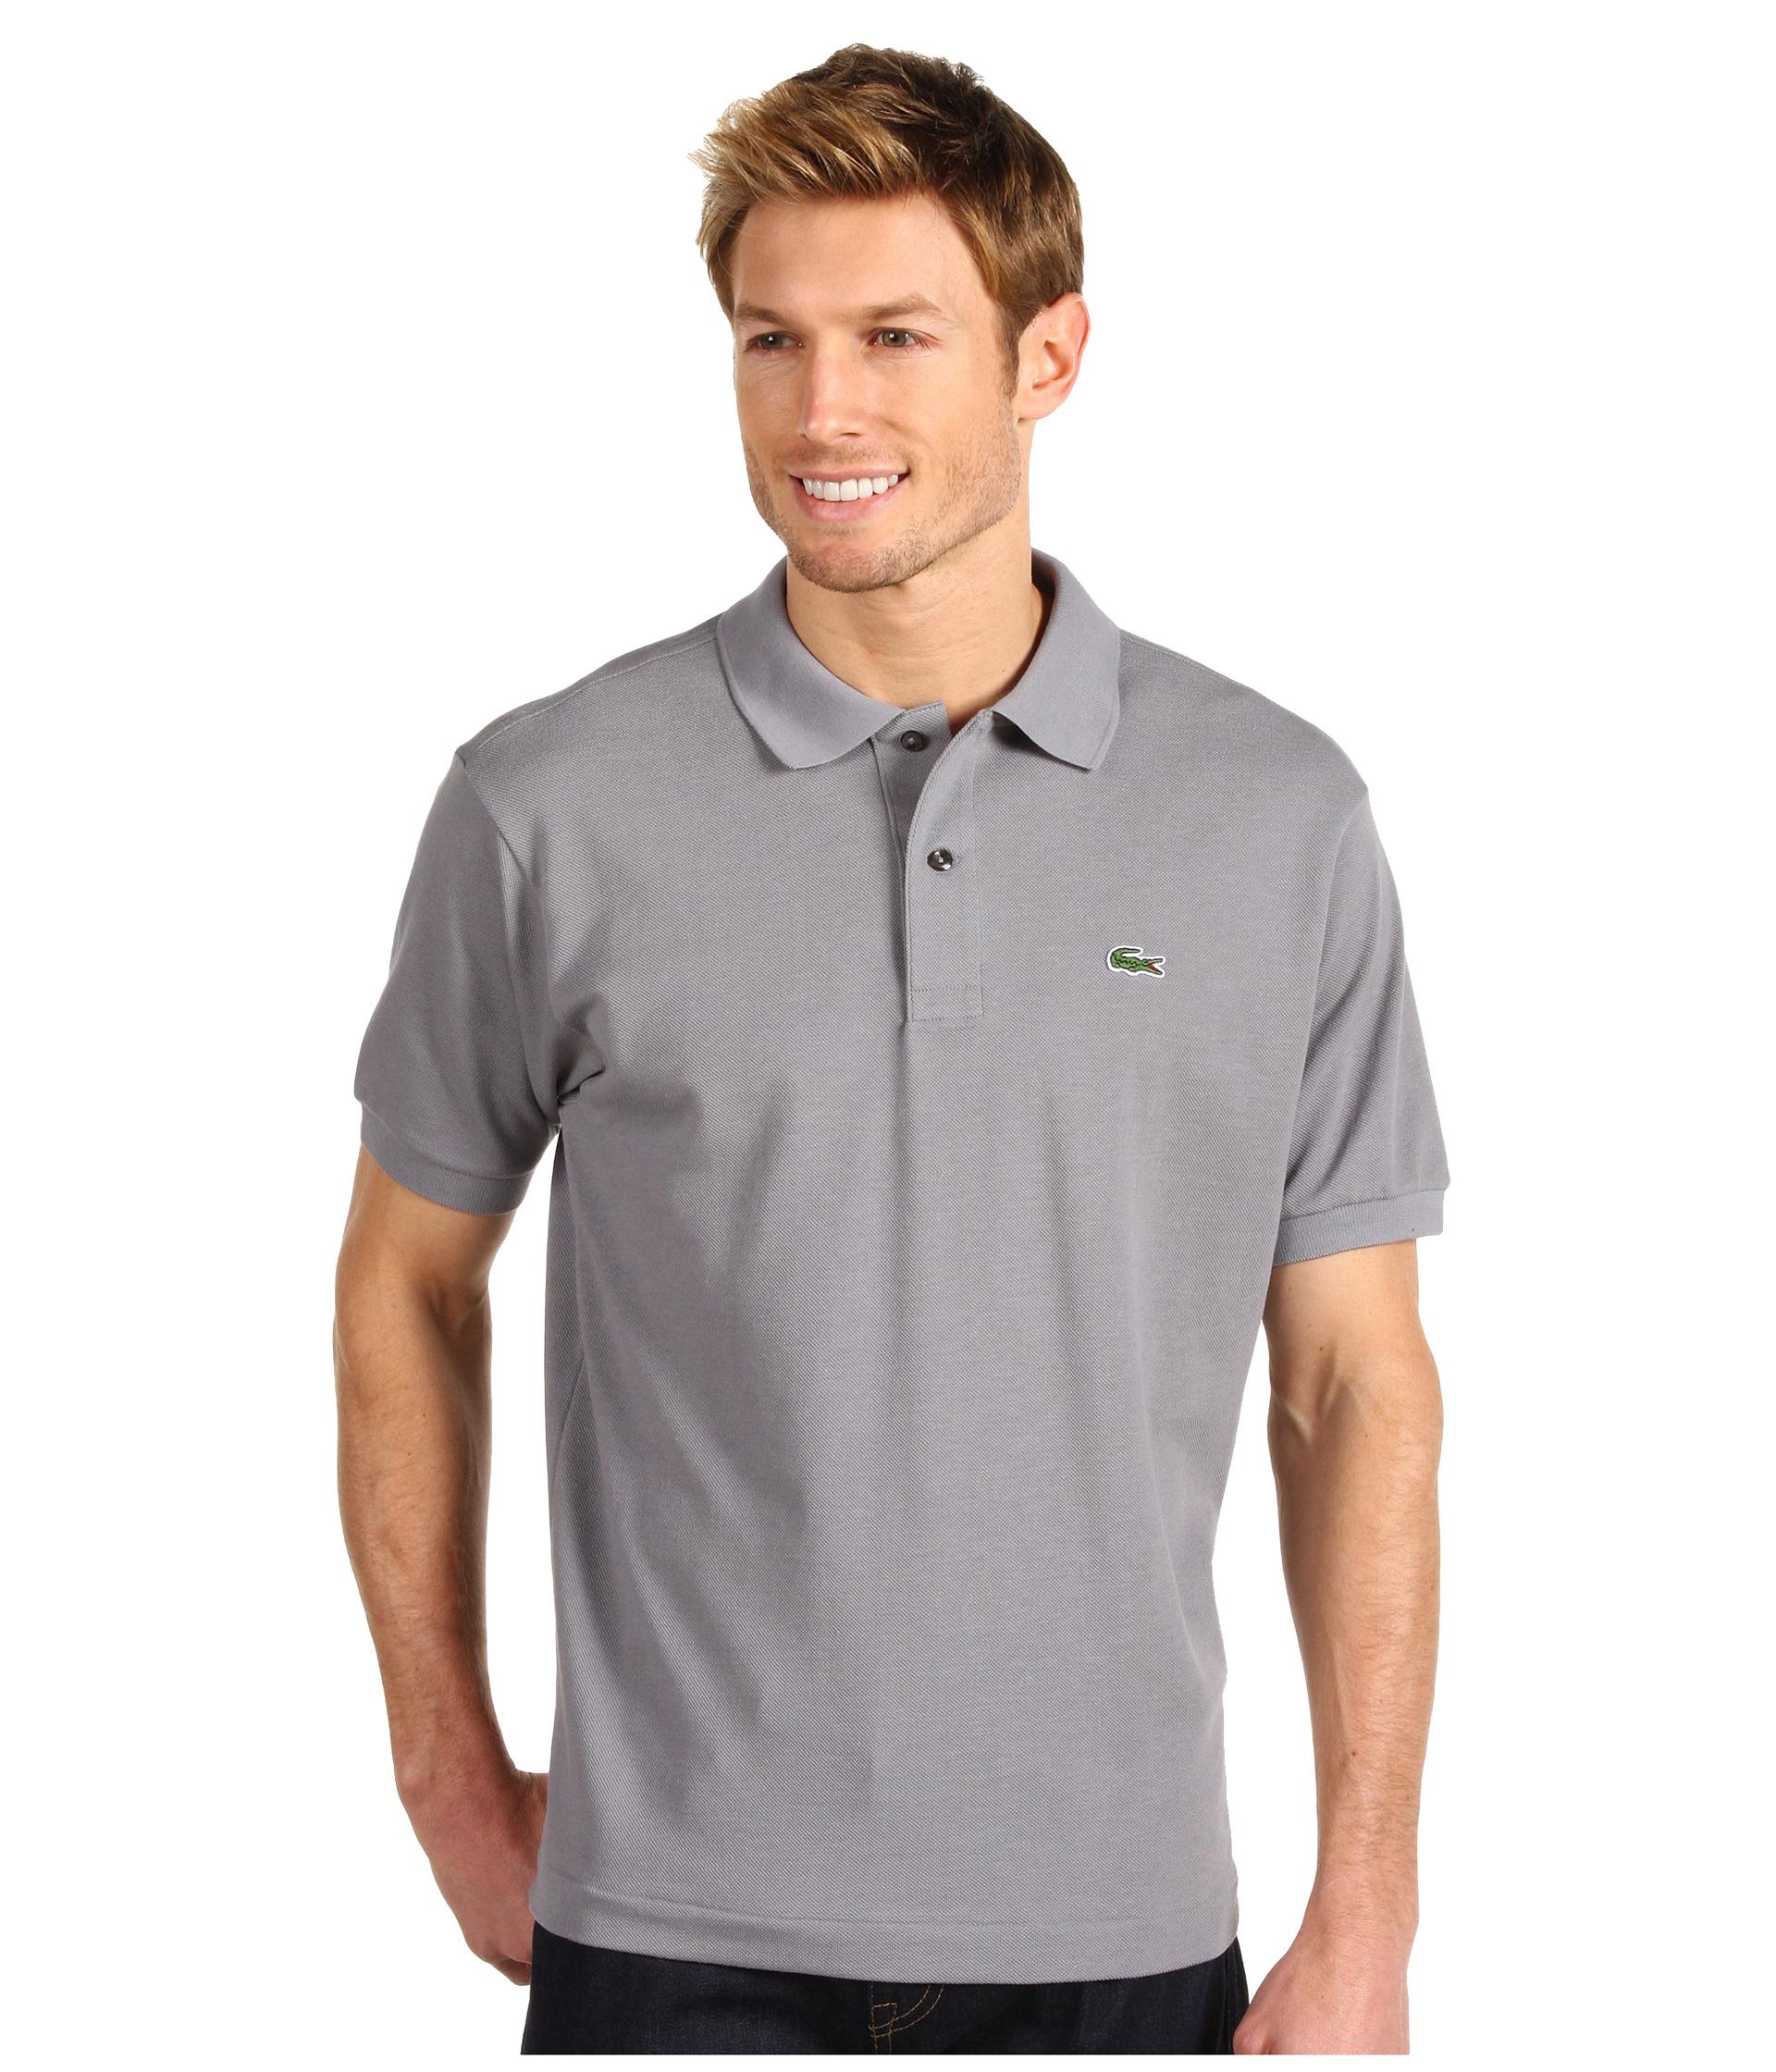 Lacoste l1212 classic pique polo shirt platinum zappos for Lacoste size 4 polo shirt